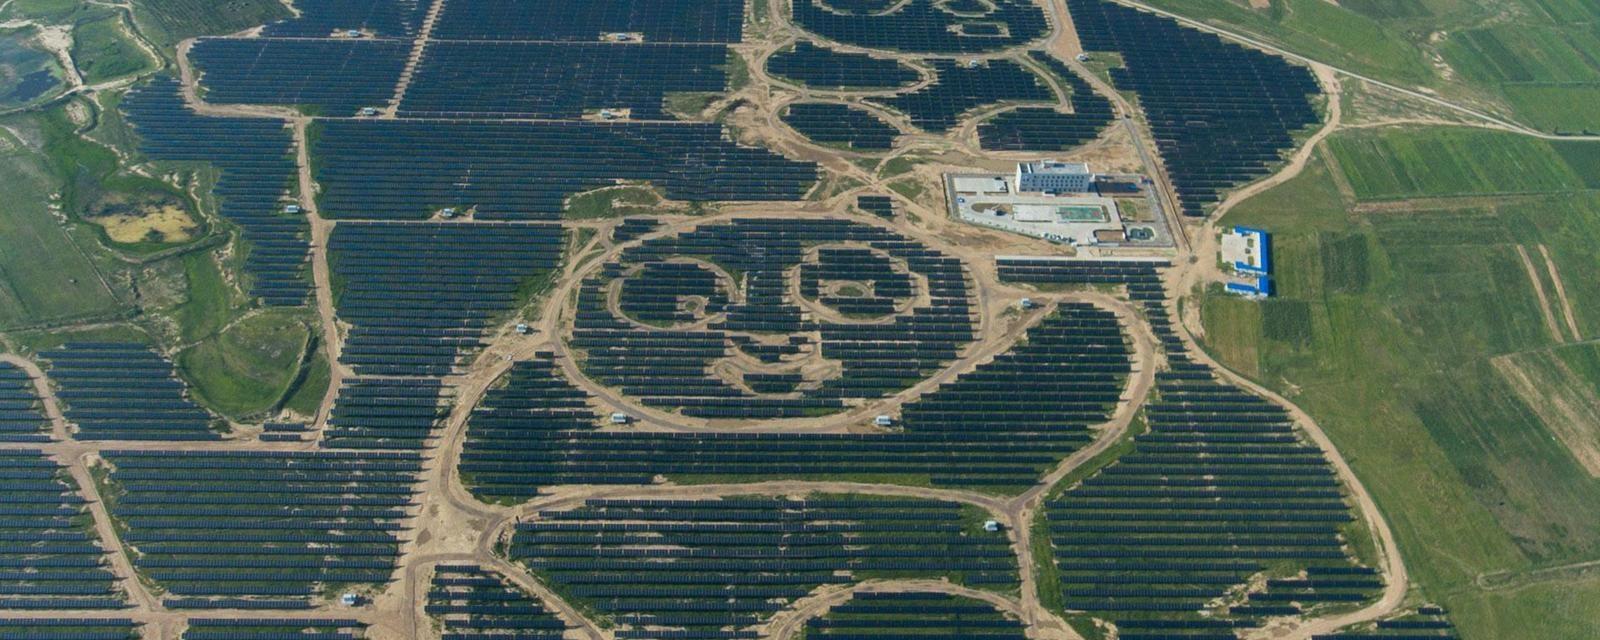 248 Acre Panda Shaped Solar PV Plants